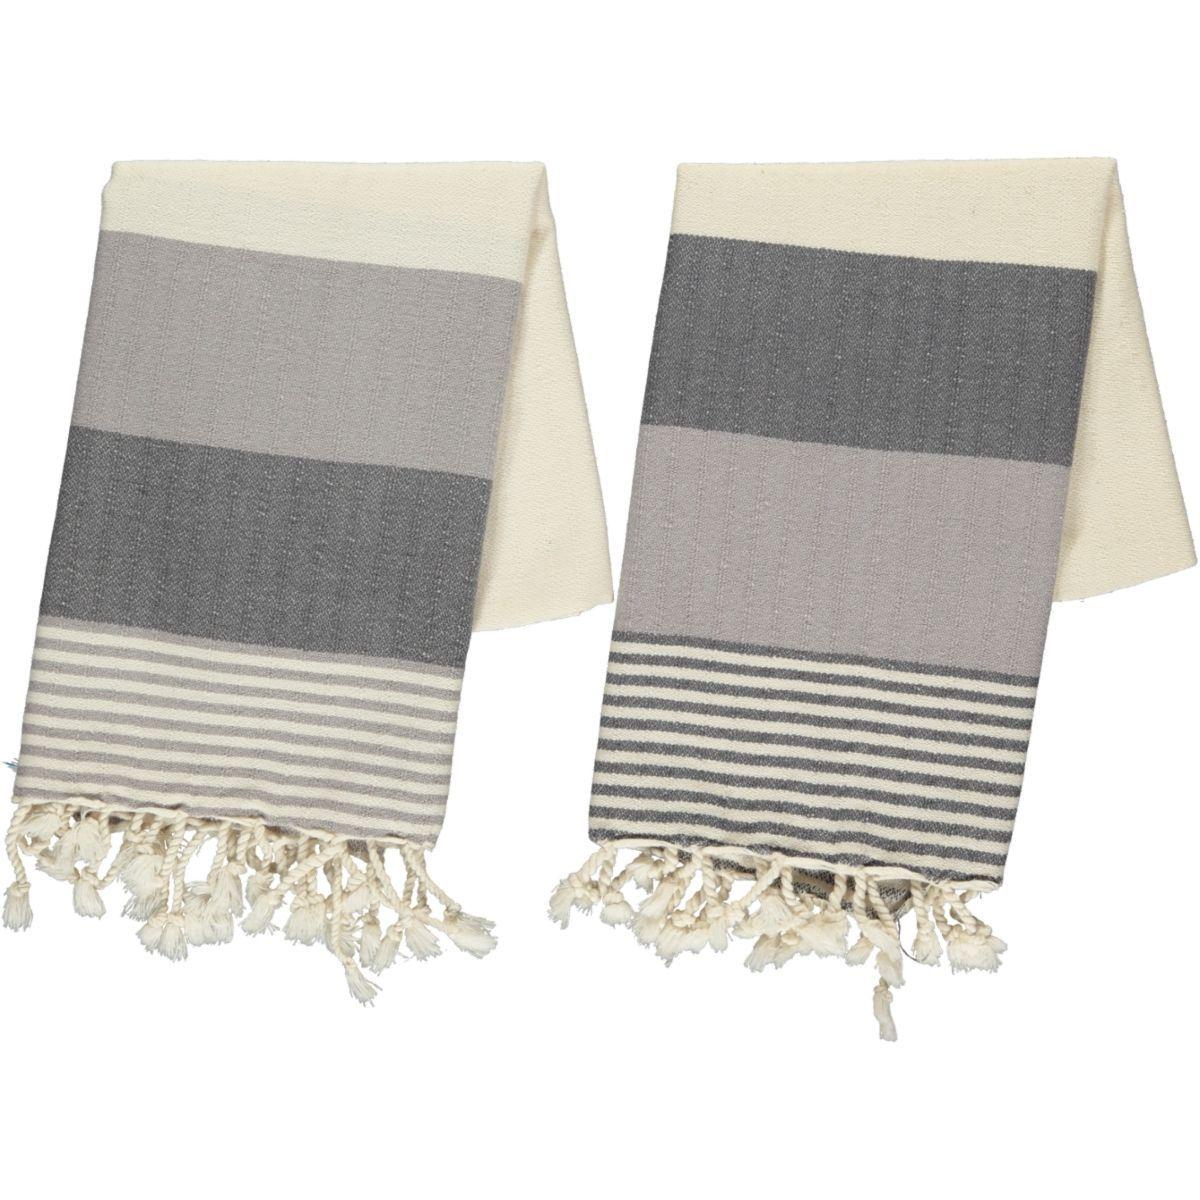 Peshkir Twin Sultan - Dark Grey / Light Grey